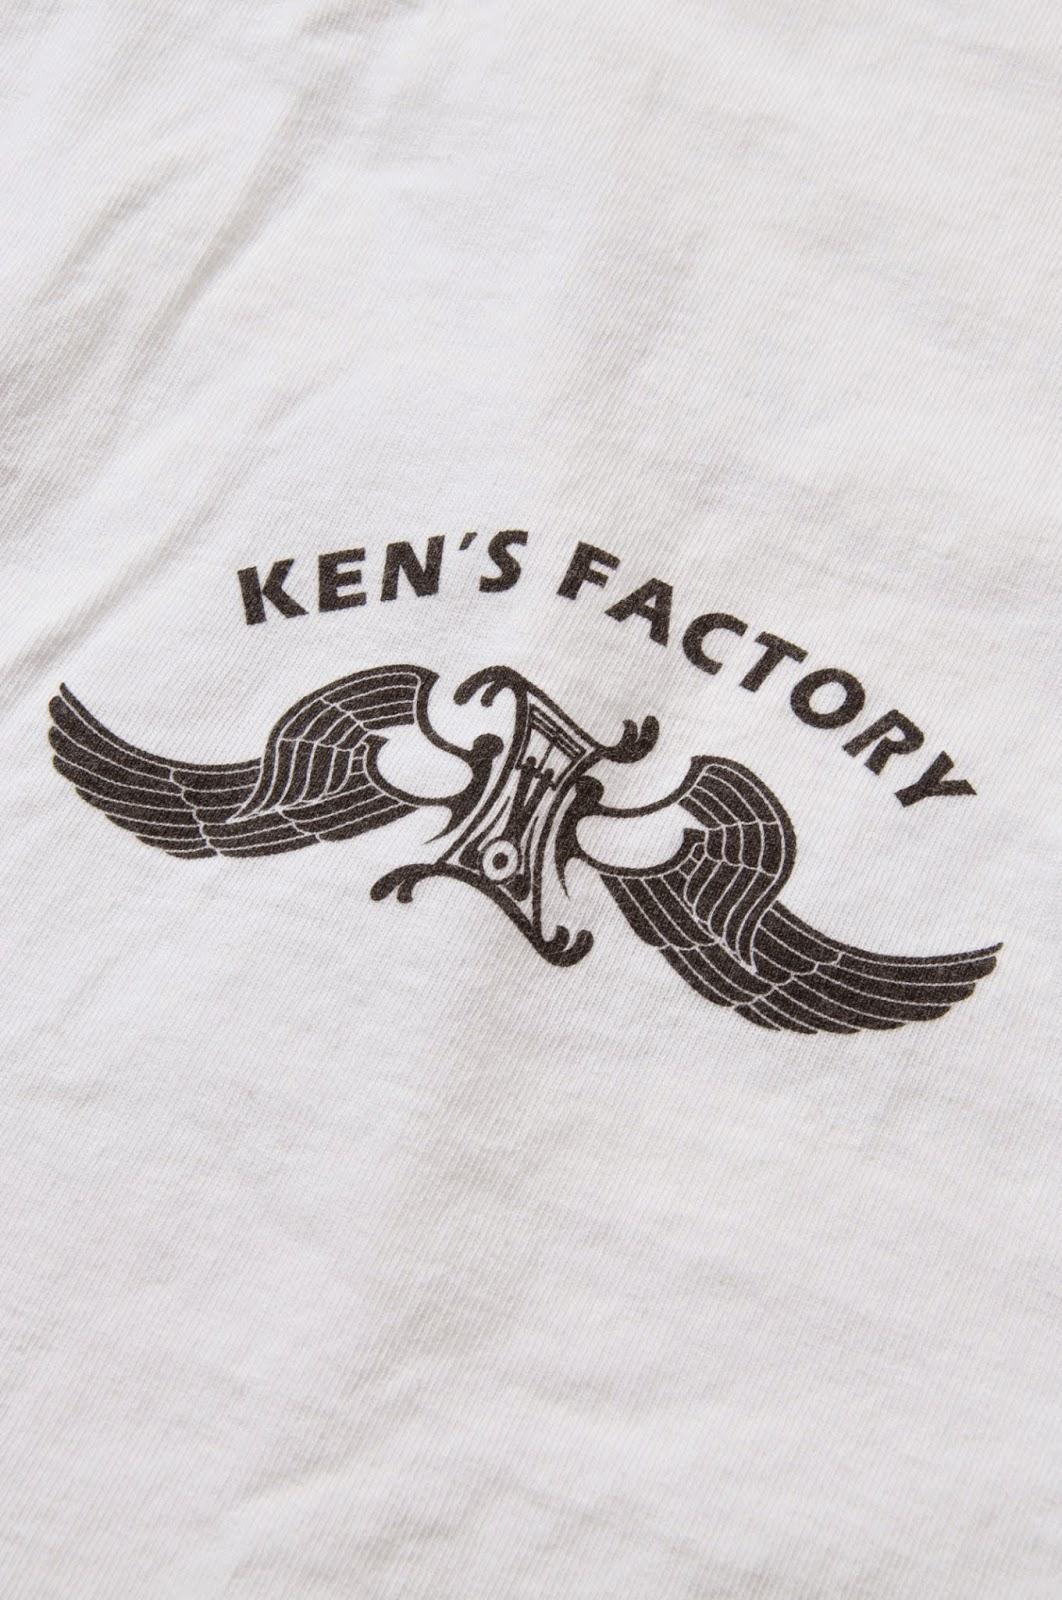 http://kens-factory.shop-pro.jp/?pid=80396865